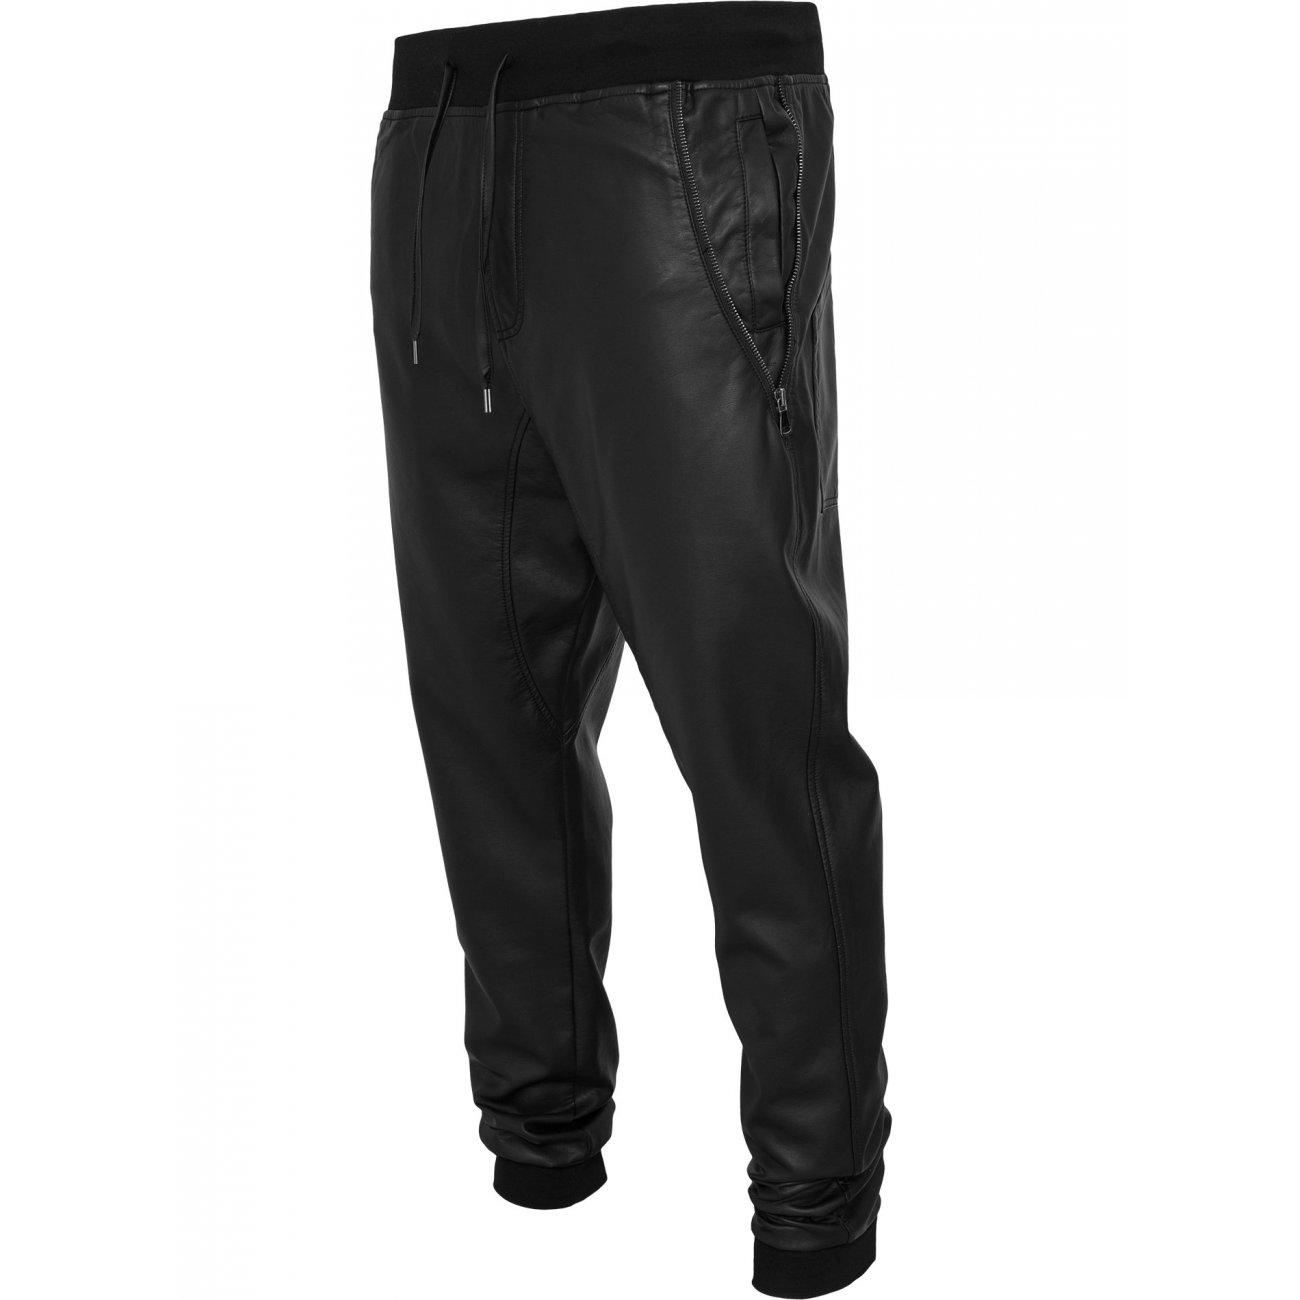 urban classics kunstlederhose deep crotch pants tb 826 schwarz. Black Bedroom Furniture Sets. Home Design Ideas